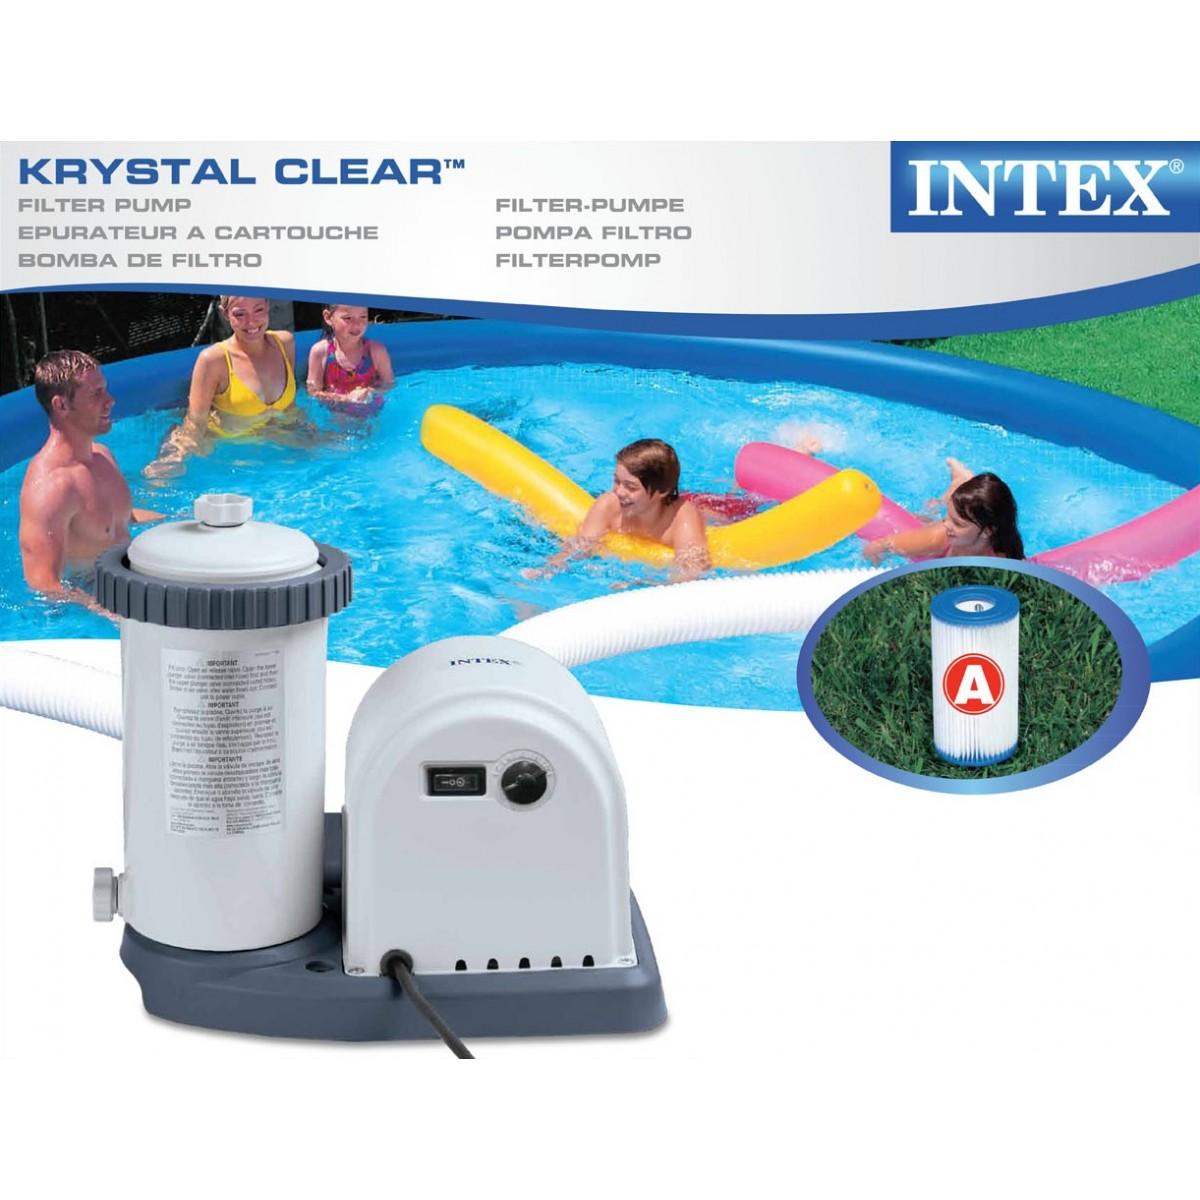 Rotex intex pompa filtro per piscina easy frame for Filtro piscina intex